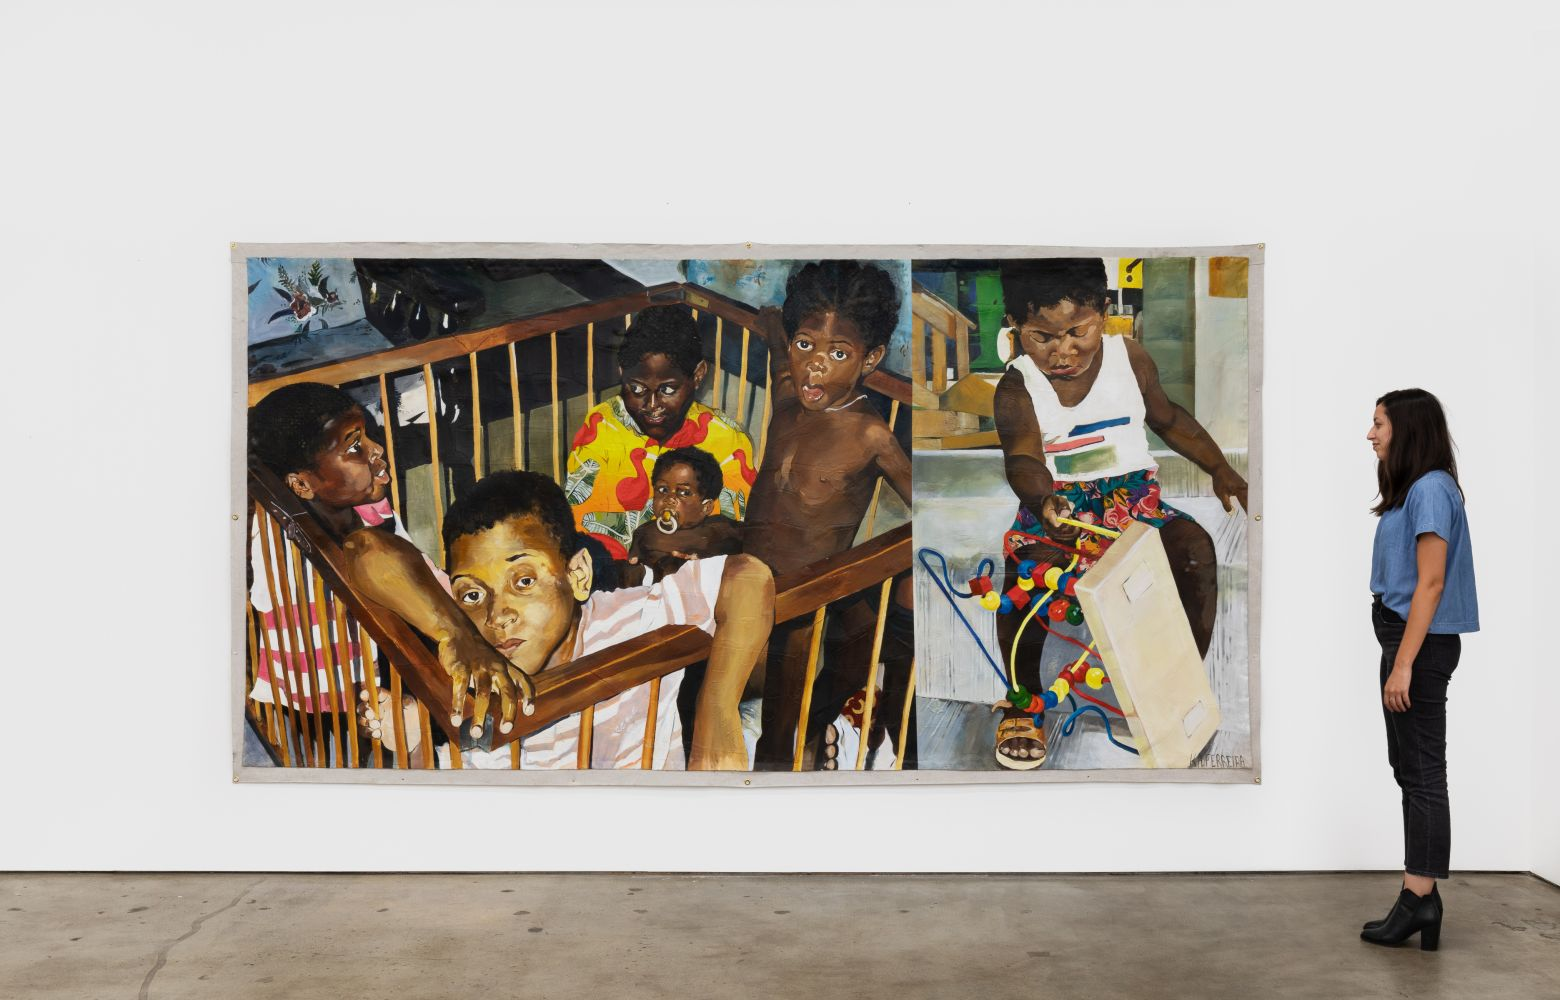 Installation View 8 of Kareem-Anthony Ferreira: First Foundation (September 12–October3, 2020). Nino Mier Gallery, Los Angeles, CA